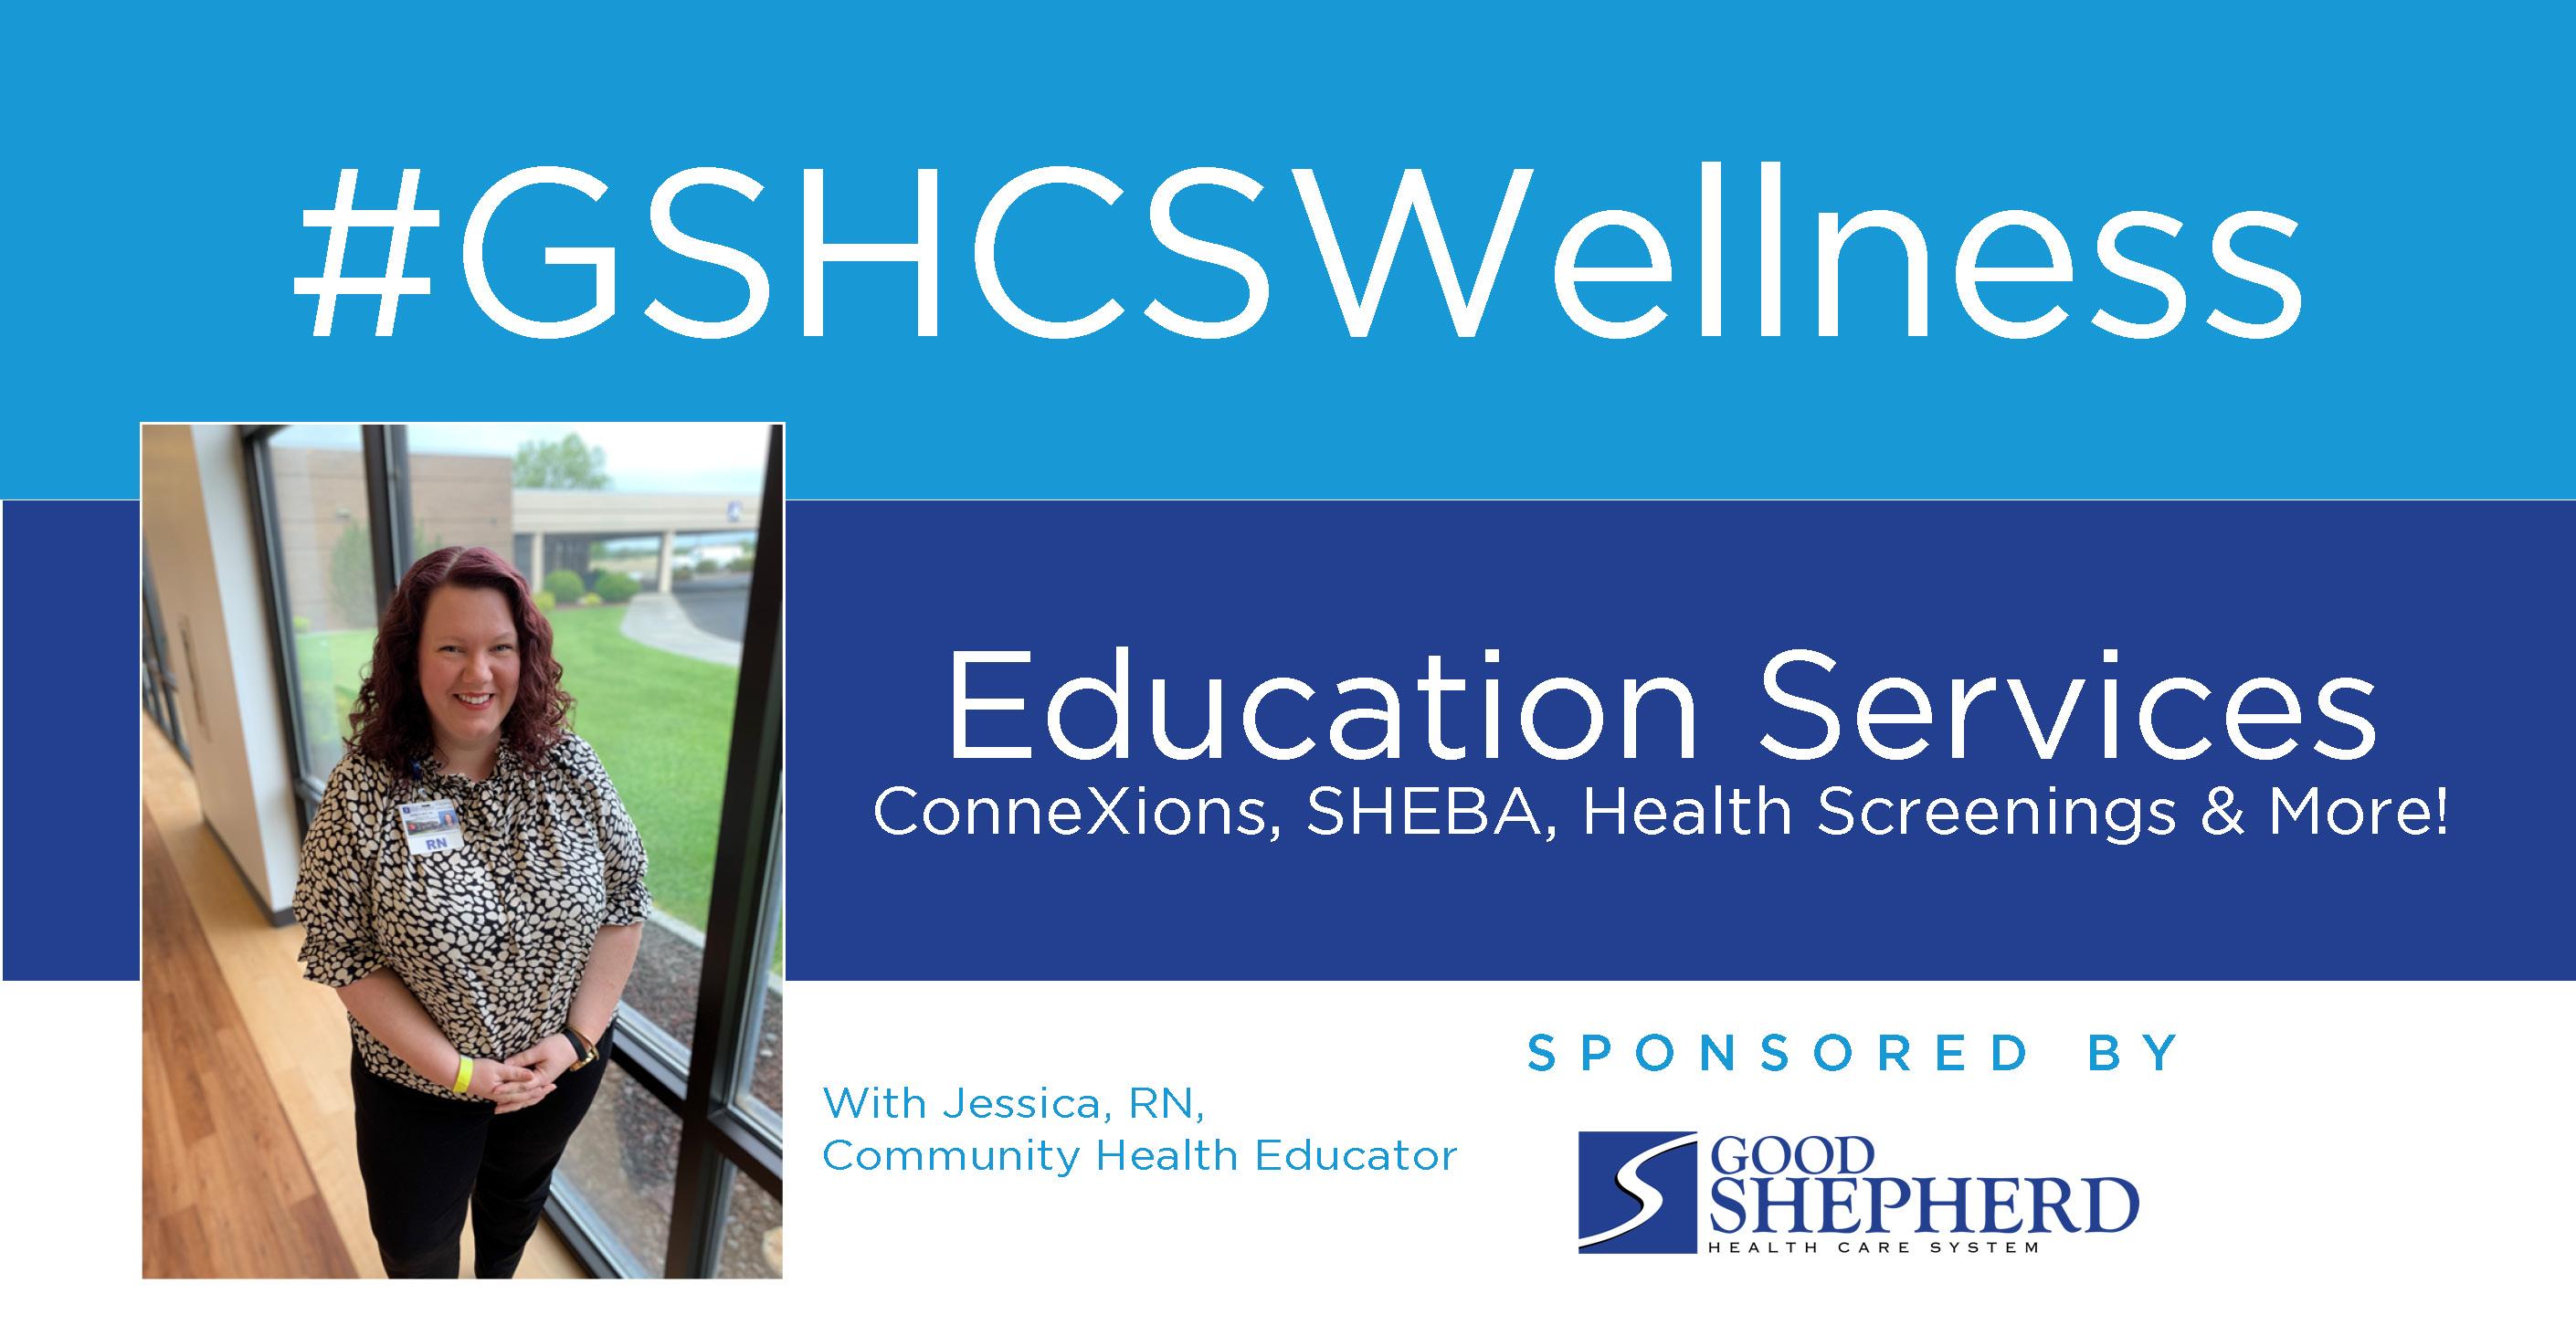 Education Services: ConneXions, SHEBA, Health Screenings & More!